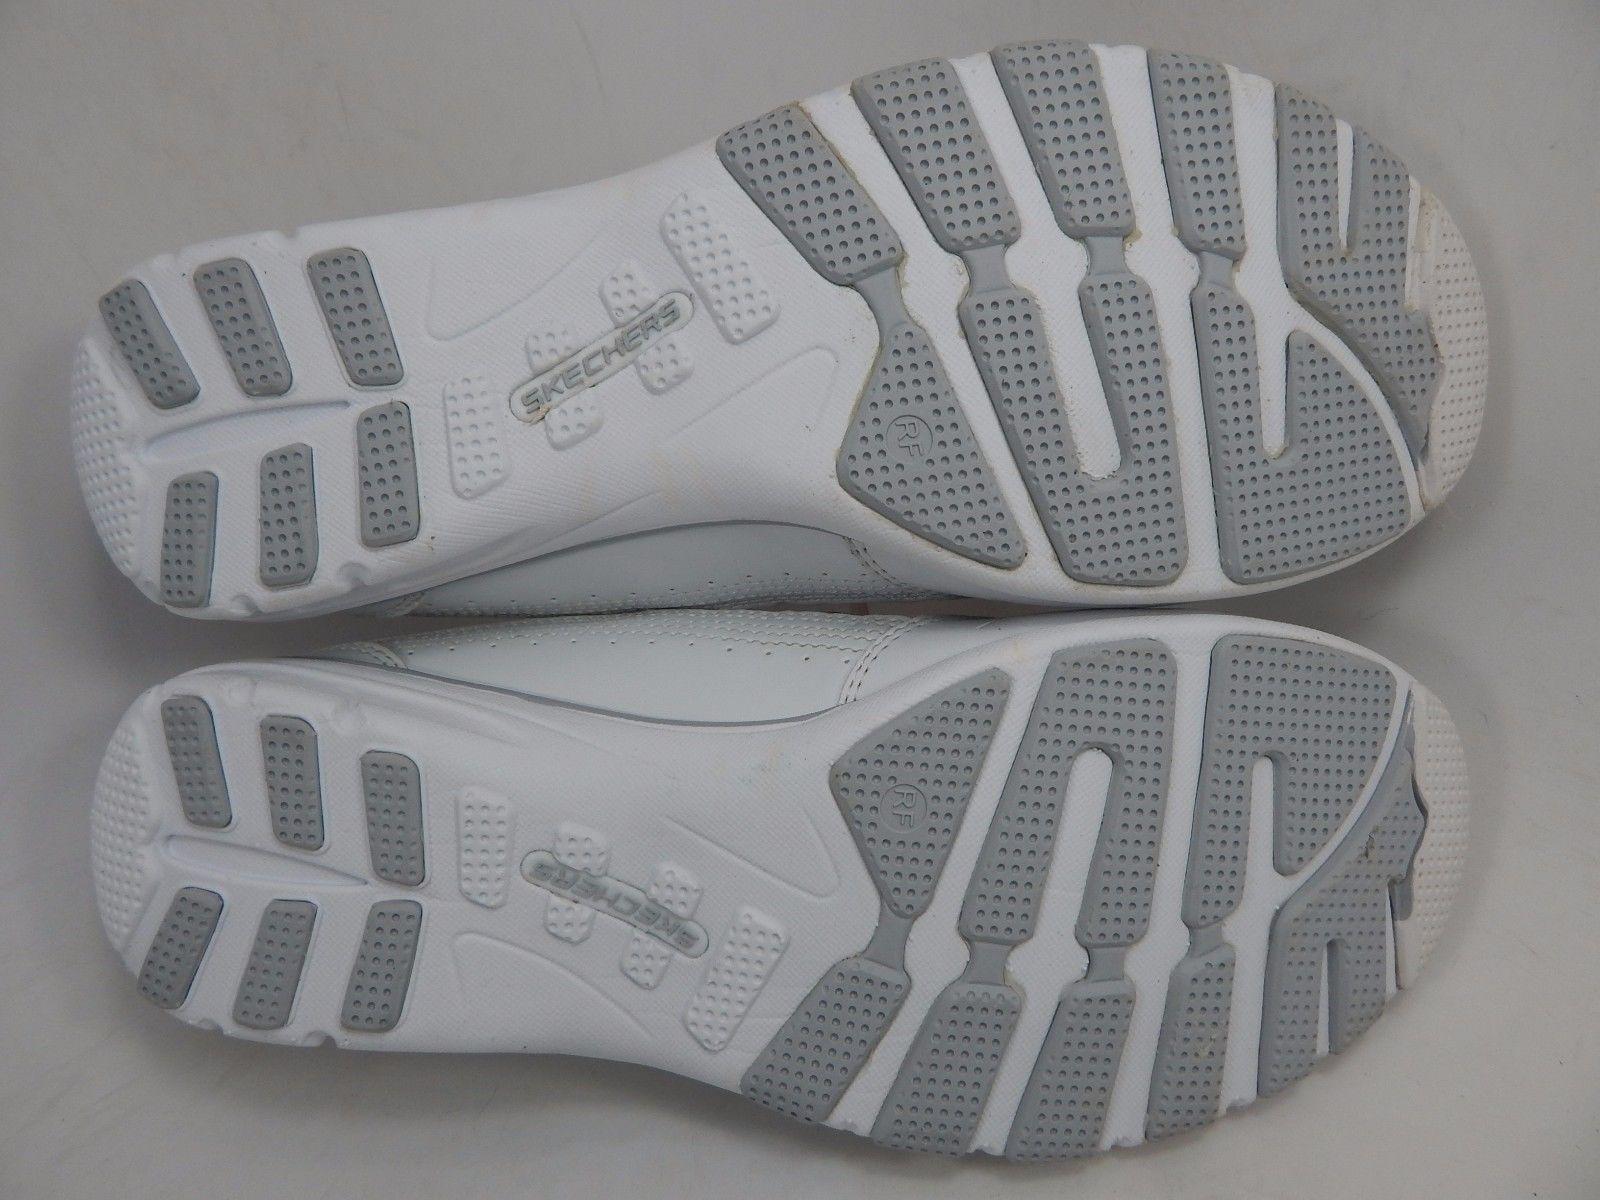 Skechers Sport Women's Conversations Real Deal Mule Shoes Size US 8 M (B) EU 38